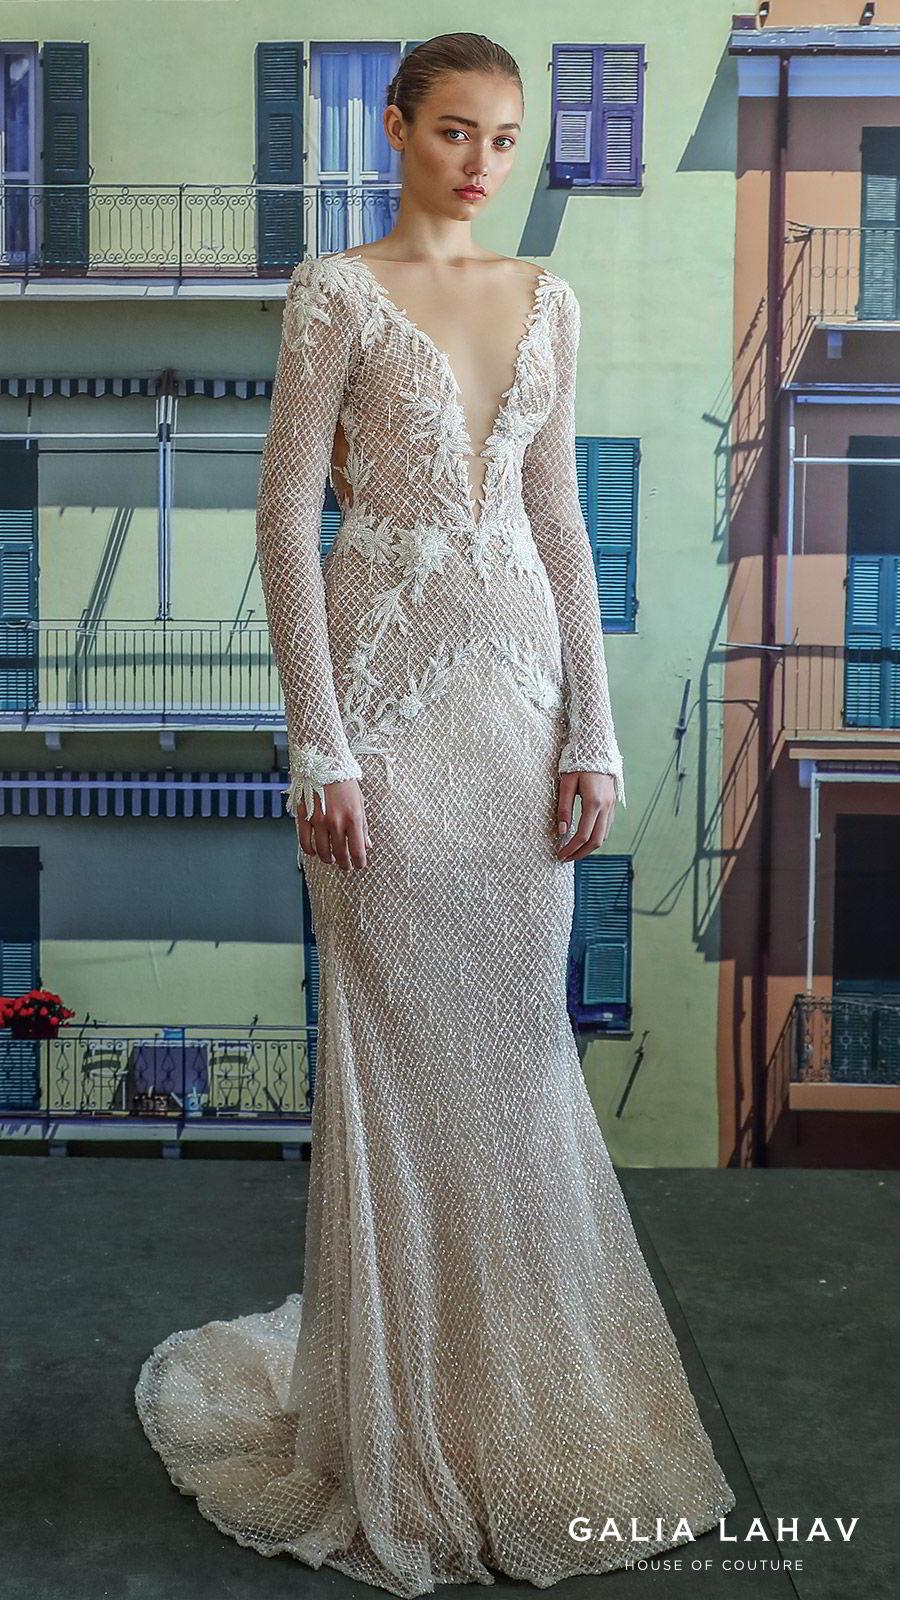 galia lahav fall 2019 bridal long sleevess plunging v neckline fully embellished sheath mermaid wedding dress open back glam glitzy elegant sweep train (estelle) mv